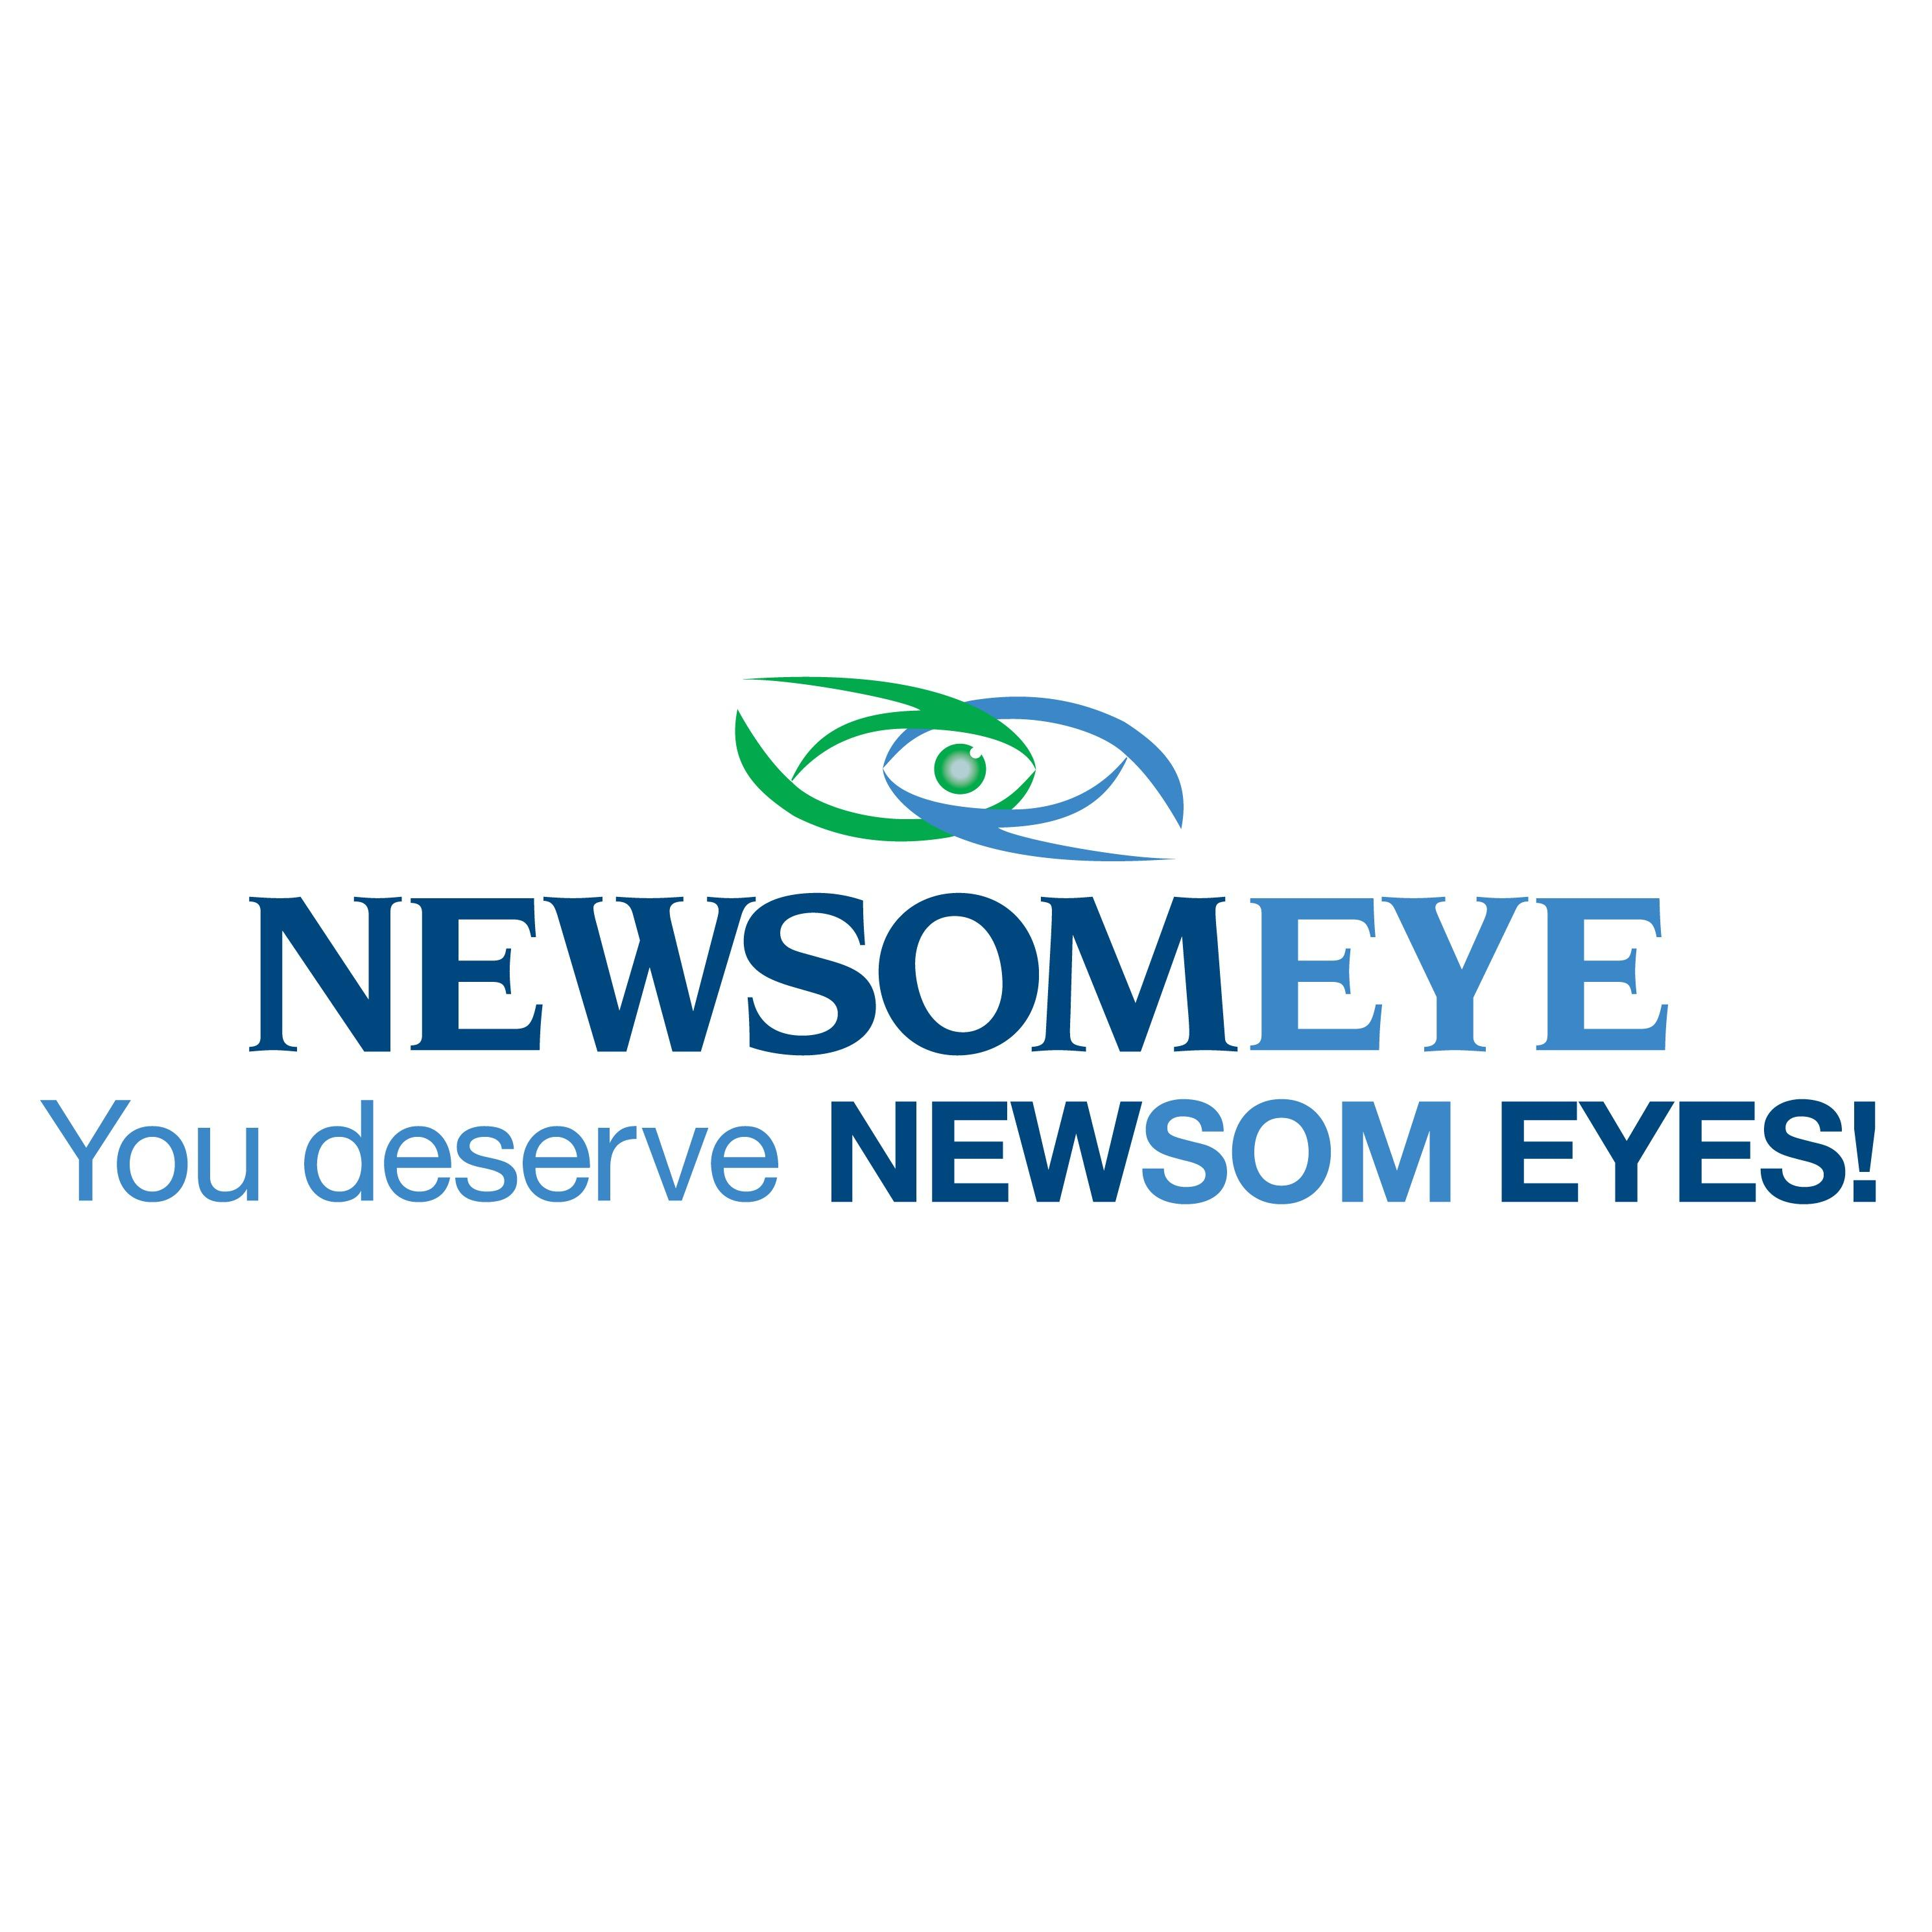 Newsom Eye - South Tampa - Tampa, FL 33609 - (813)908-2020 | ShowMeLocal.com